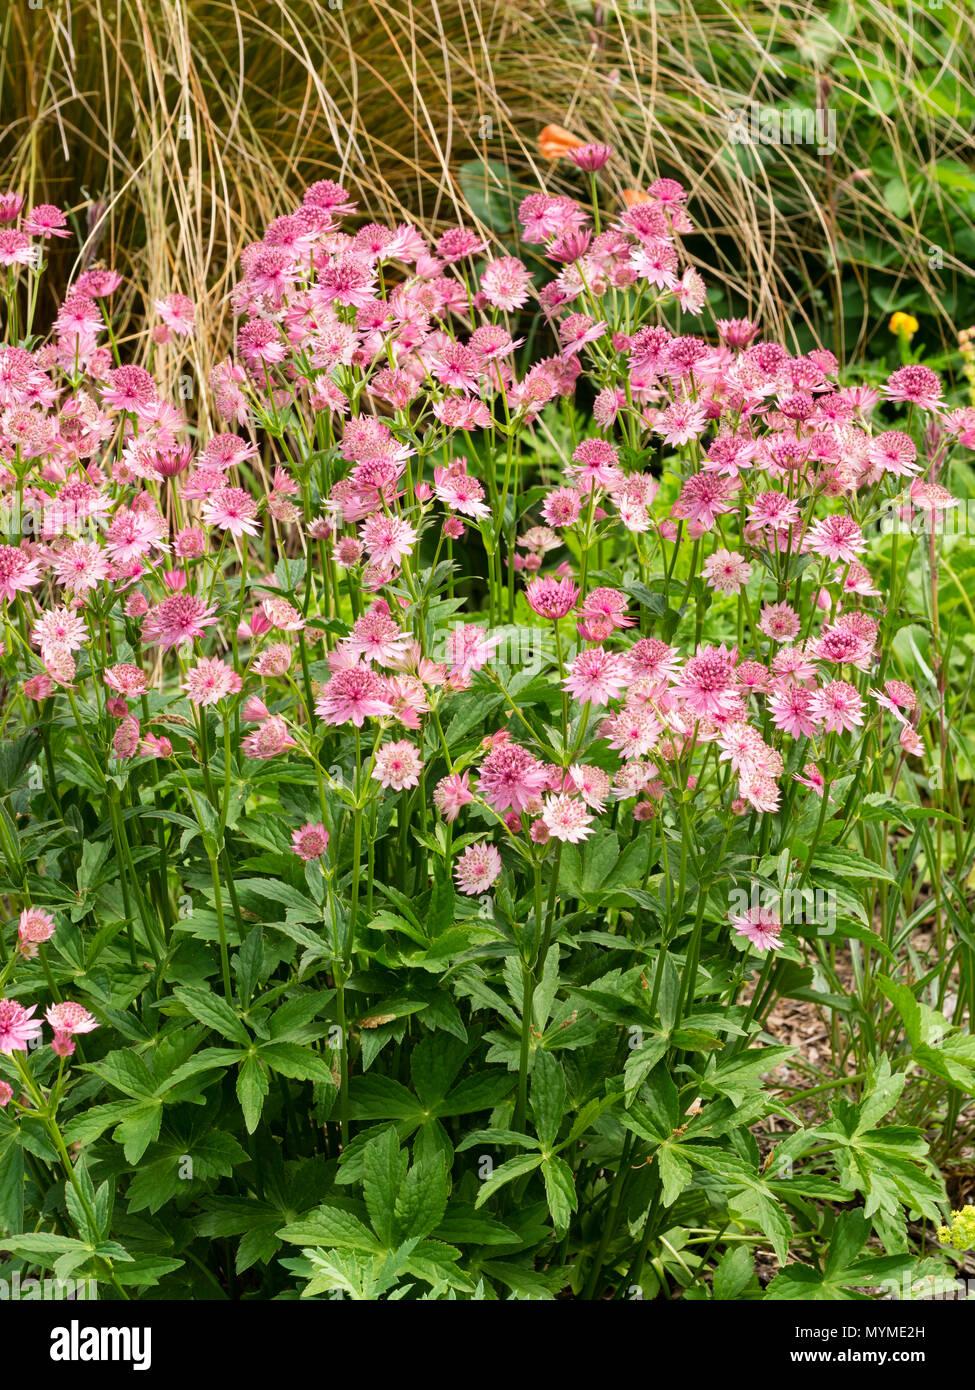 Massed Pink Flowers Of The Long Blooming Summer Flowering